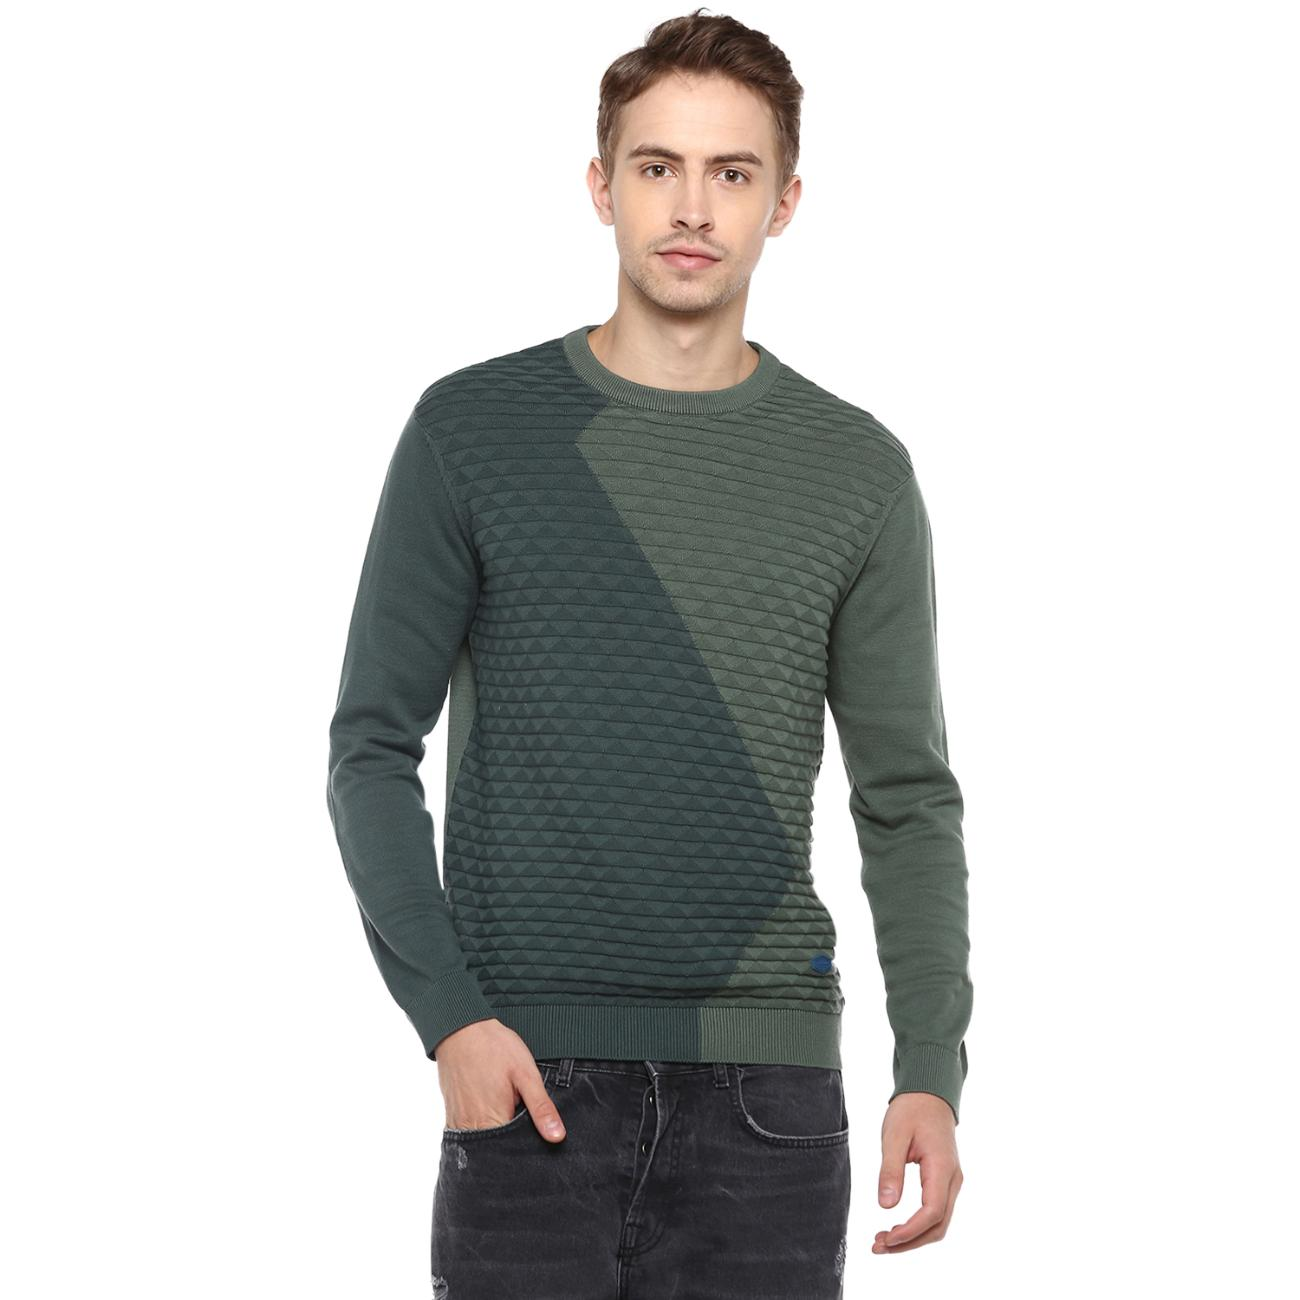 Buy Men's Green Colourblocked Sweater